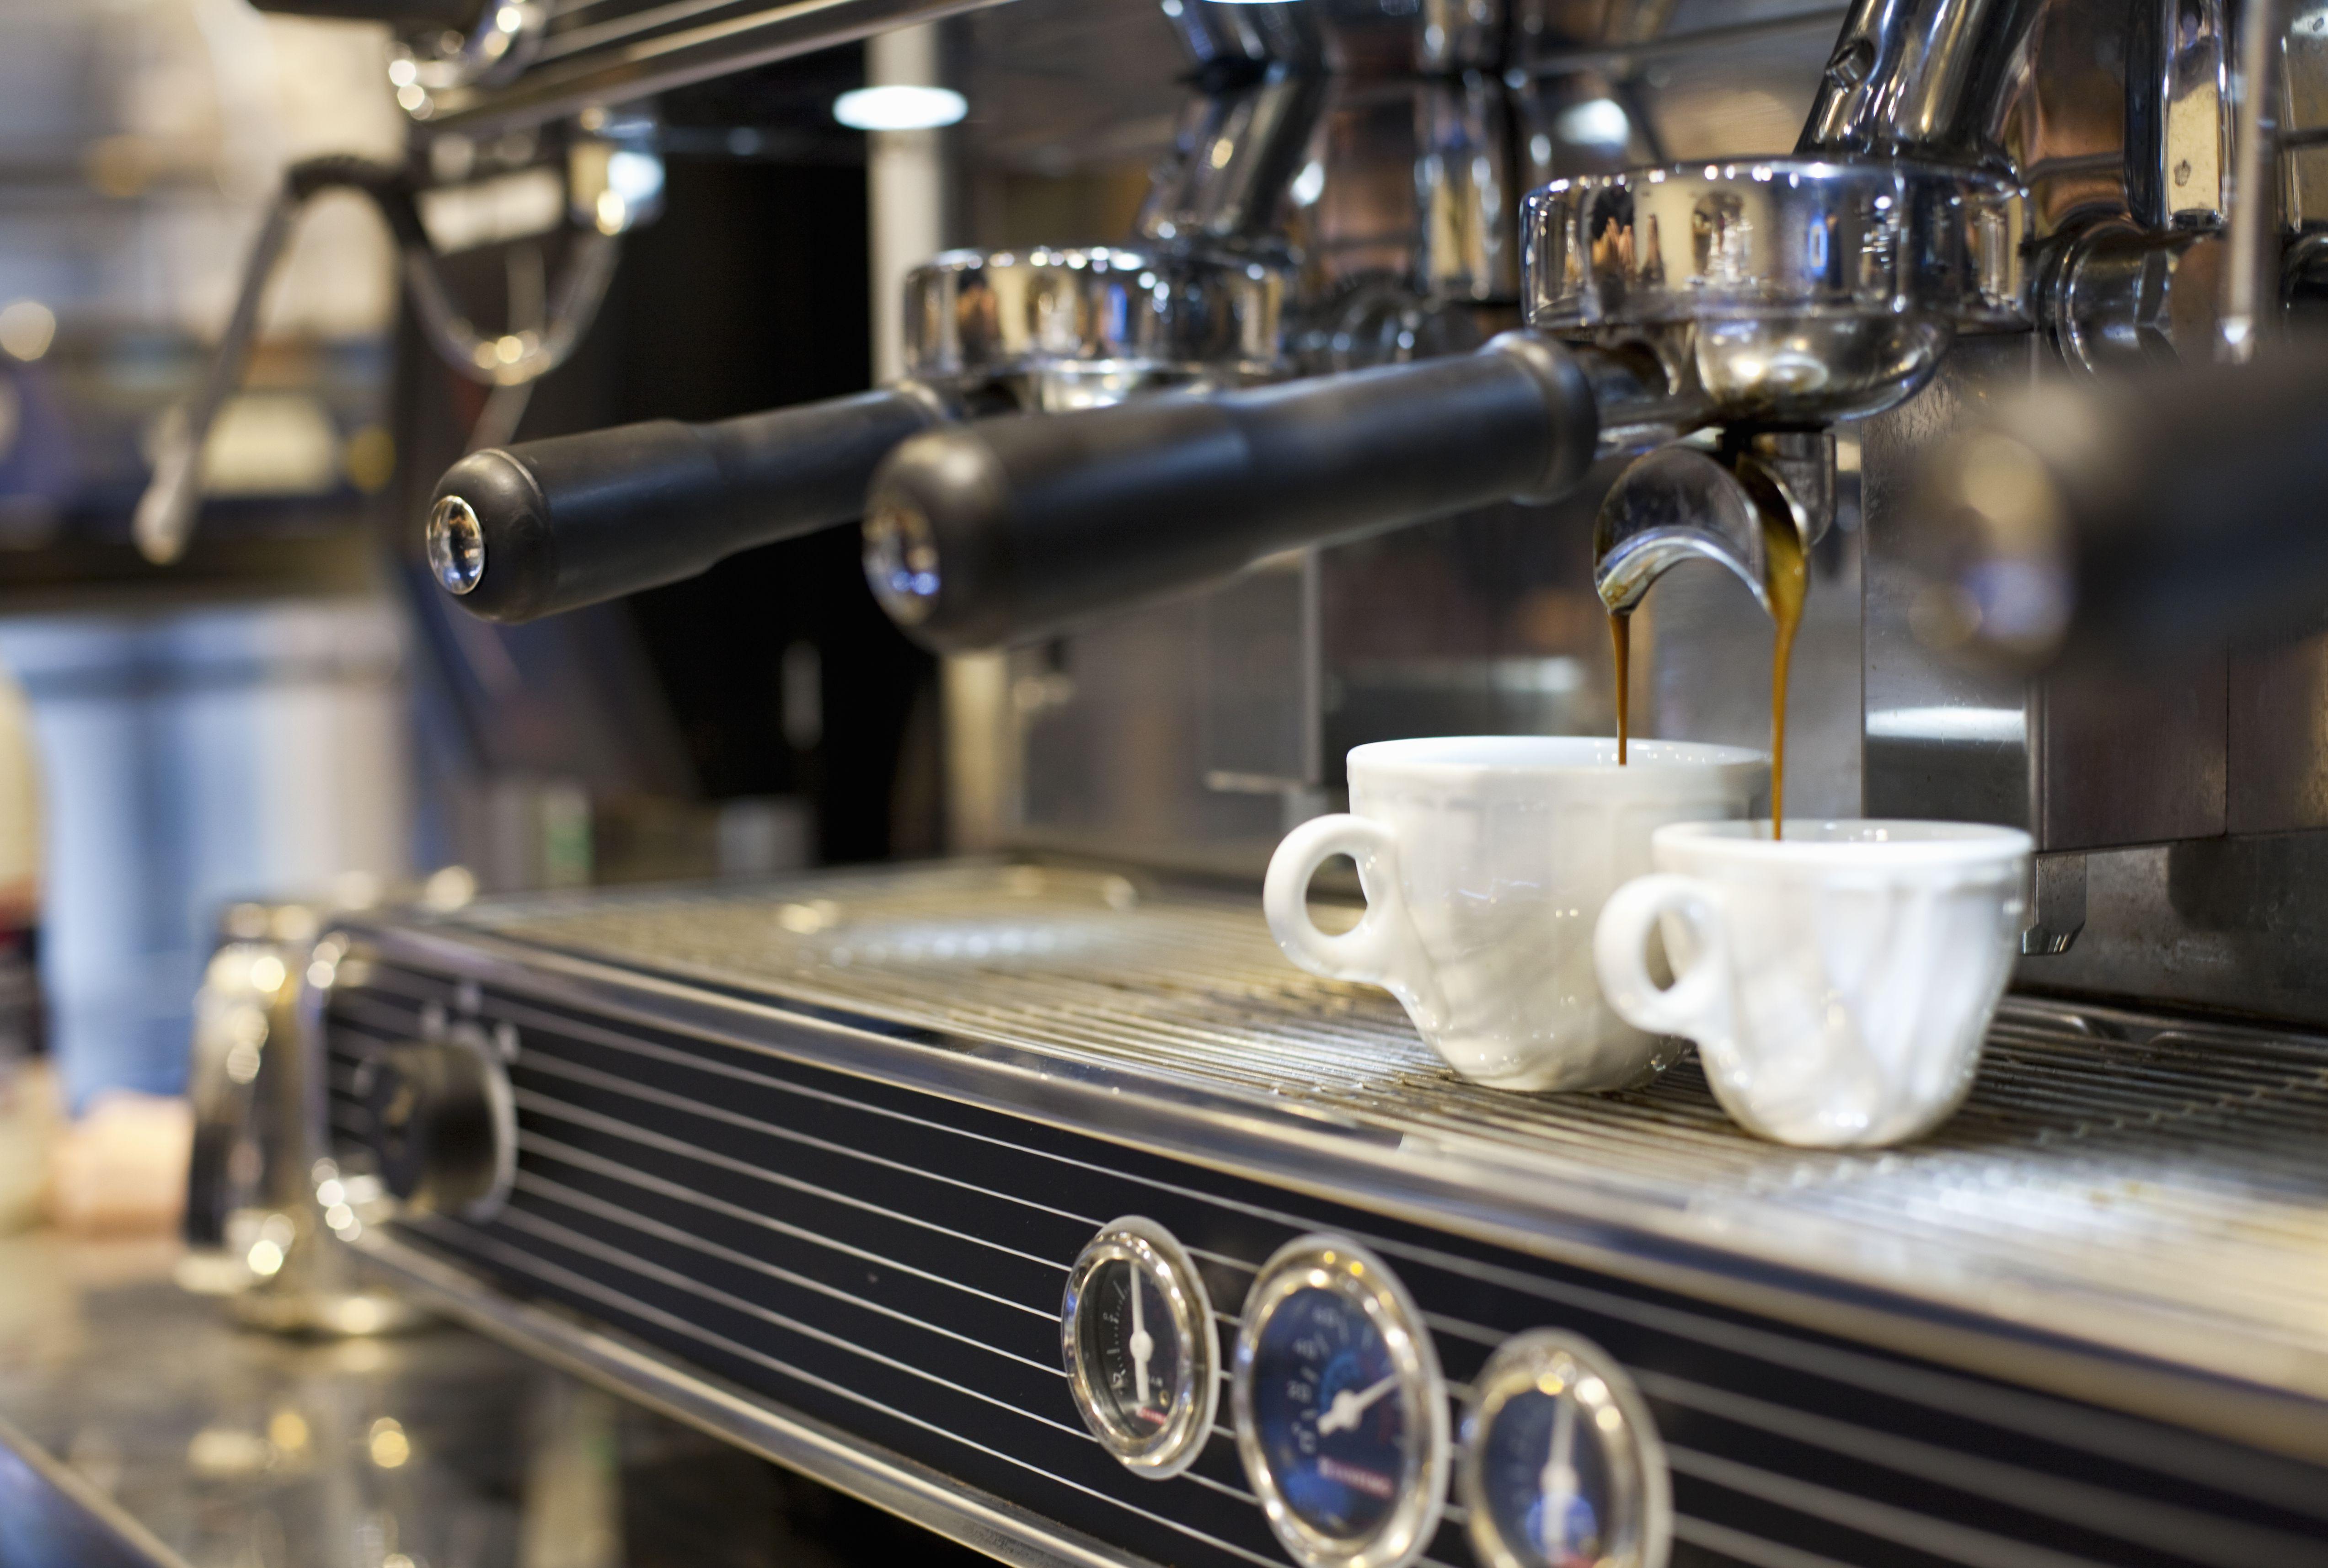 Espresso machine brewing coffee into cups